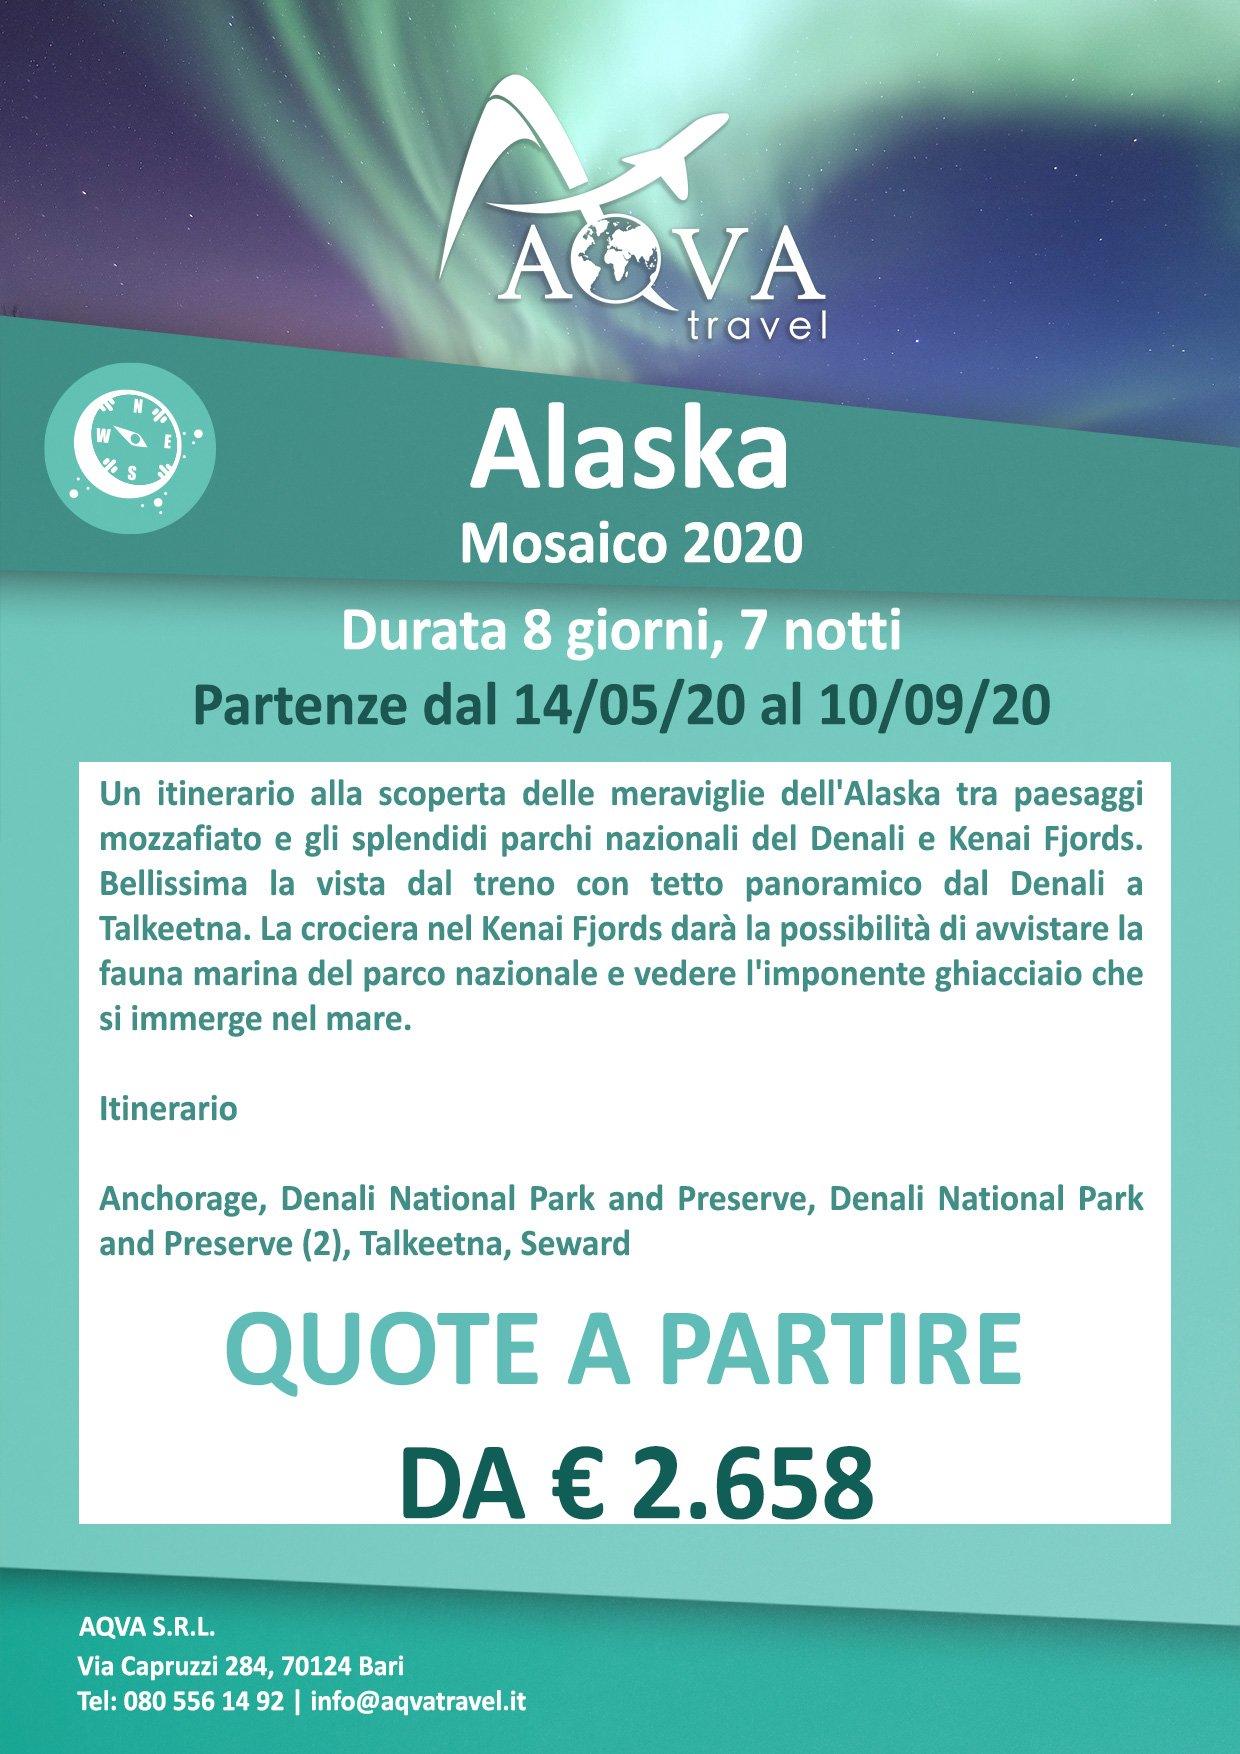 Alaska-Mosaico-2020-Avventura-offerte-agenzia-di-viaggi-Bari-AQVATRAVEL-it